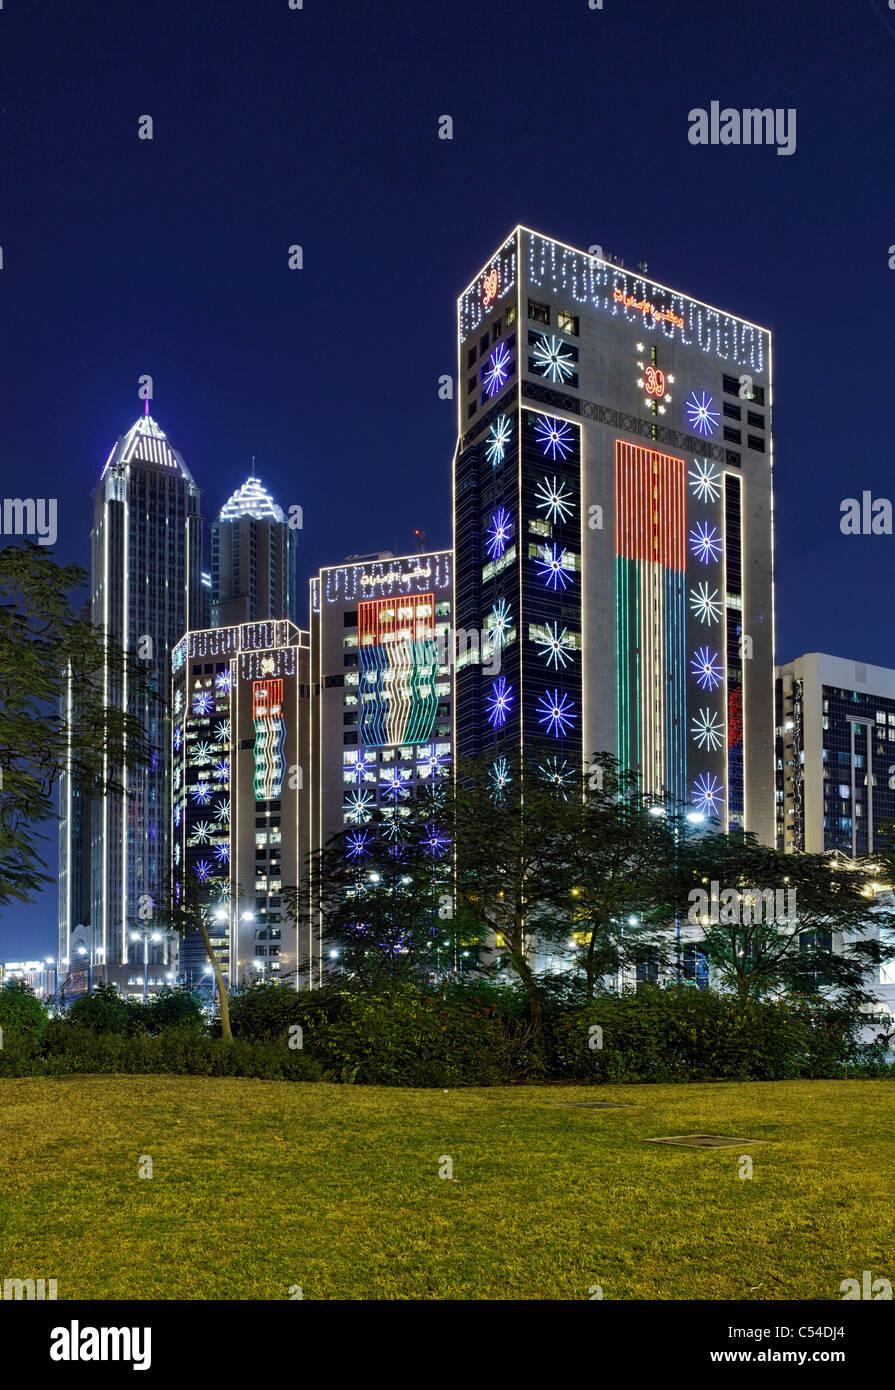 High-rise buildings on Corniche Road, illuminated with LED lights, Abu Dhabi, Corniche, Al Hosn, Emirate of Abu Stock Photo